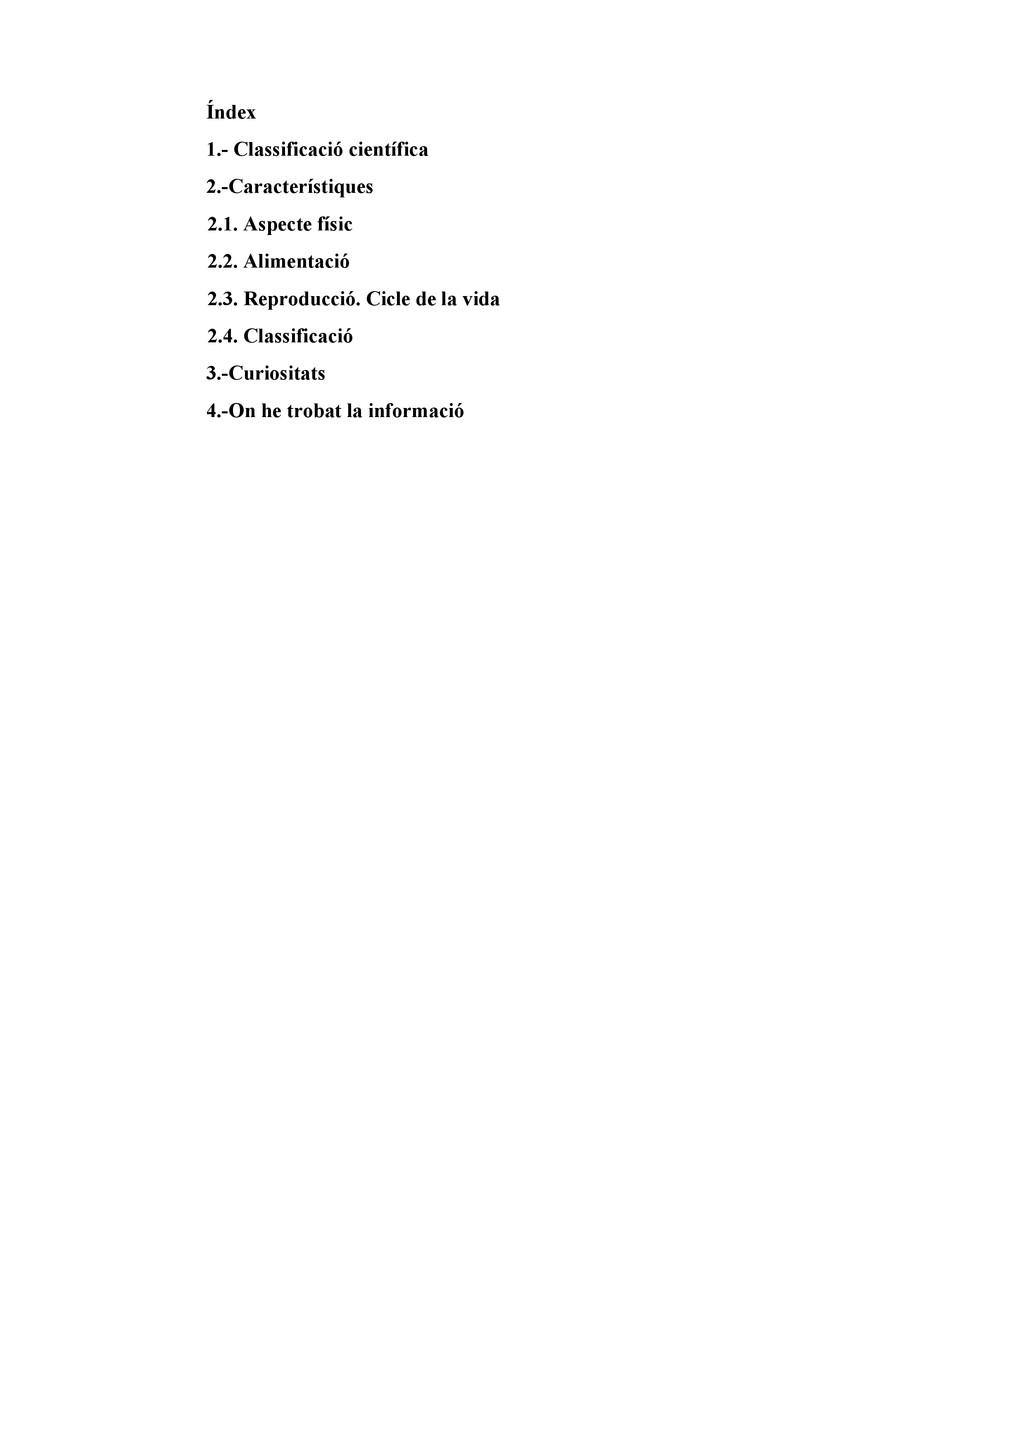 Índex 1. Classificació científica 2.Caracterí...